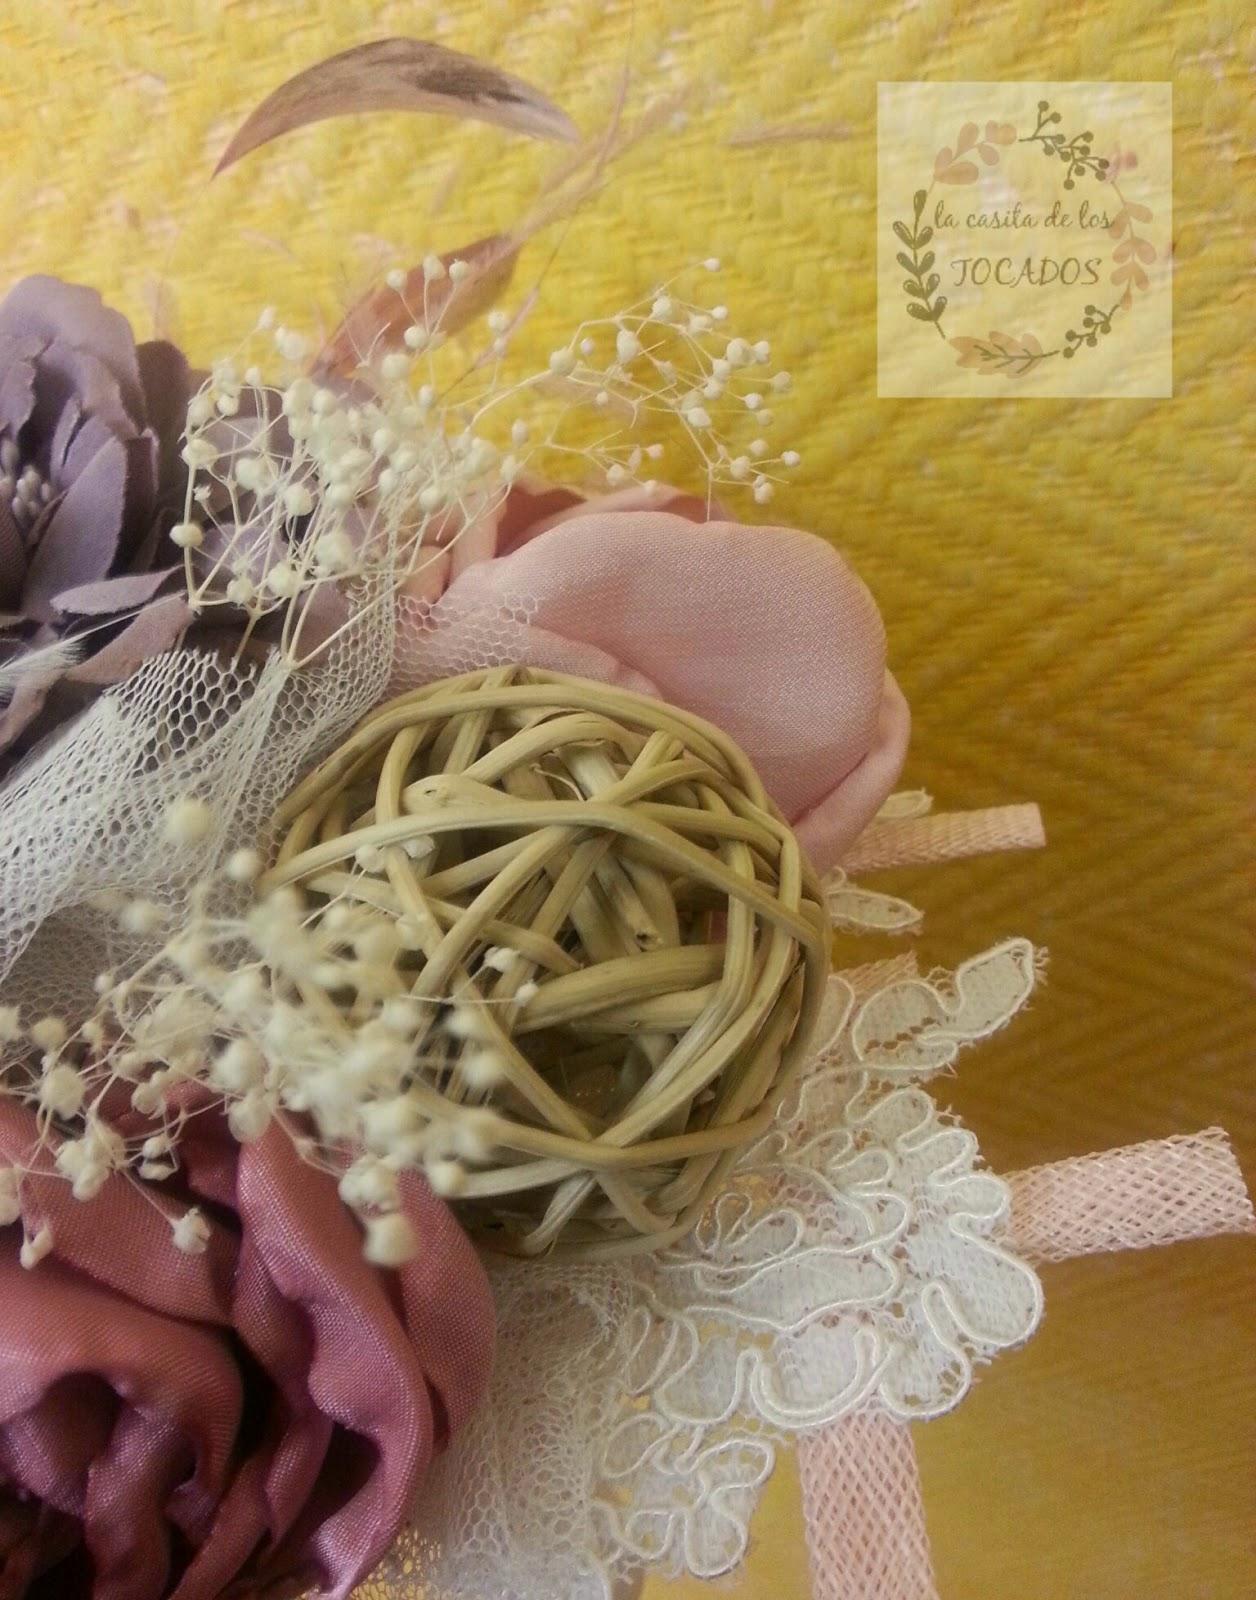 ramo de novia original realizado por encargo artesanal con flores de tela, bola de ratán, sinamay...